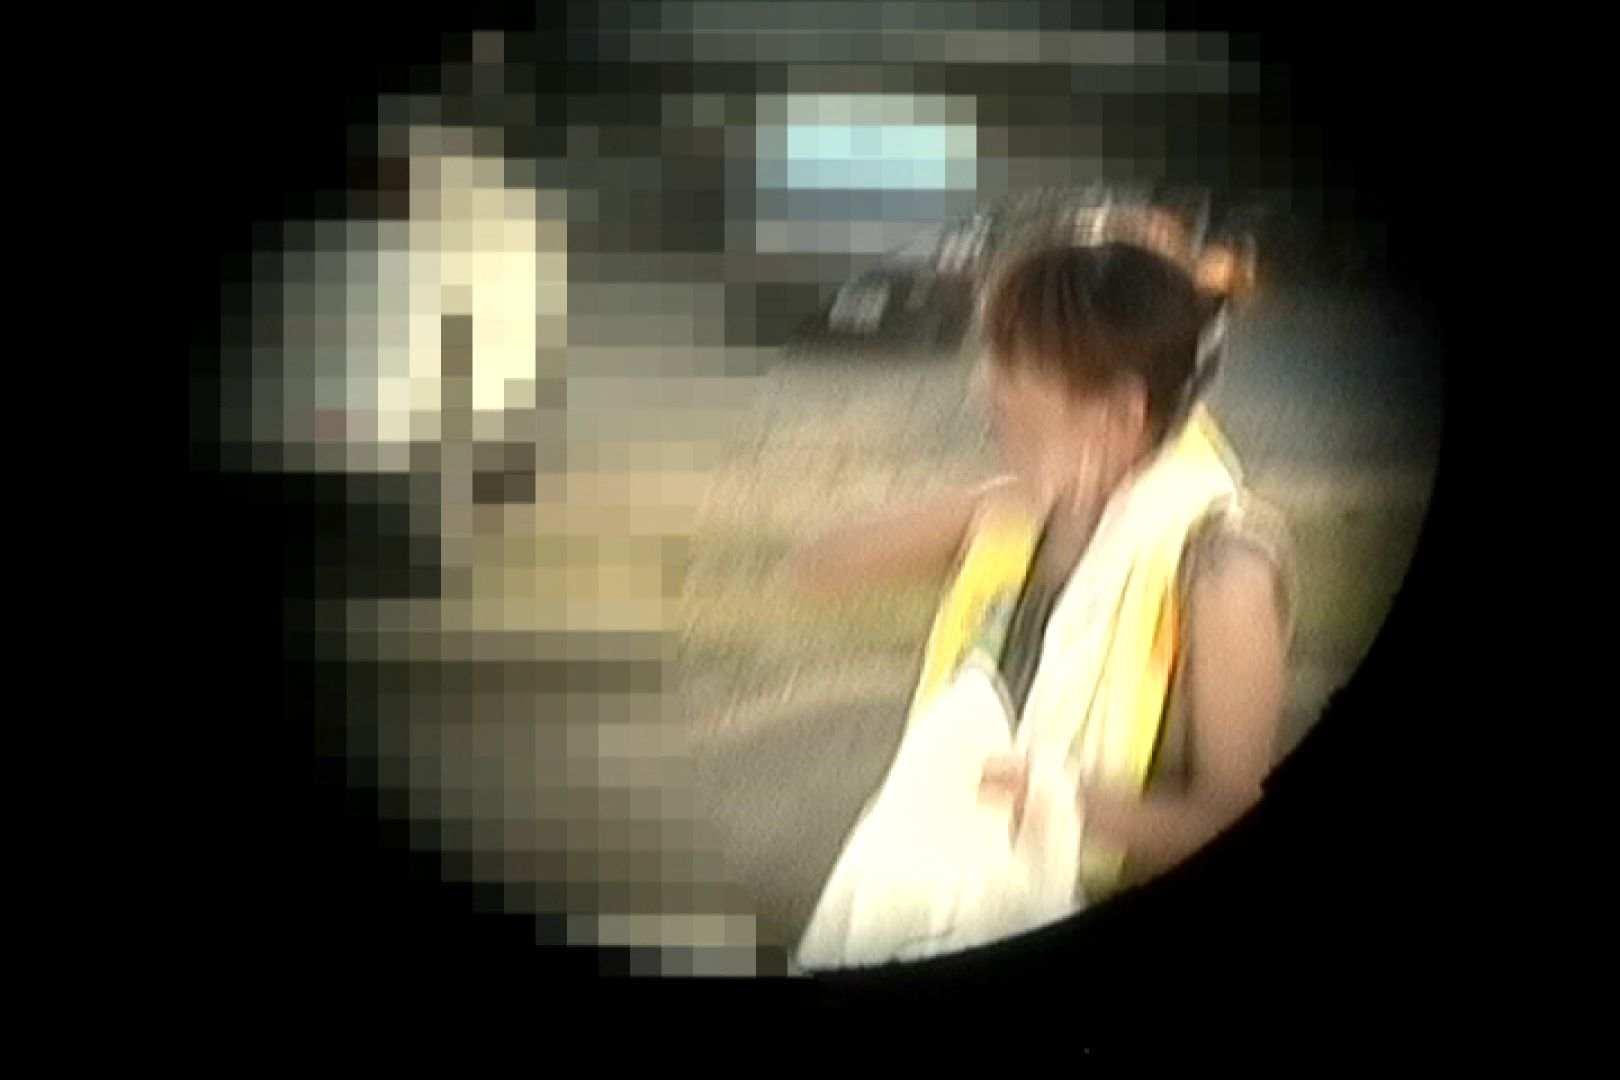 No.45 綺麗なお女市さん!さすがのテクニック!! 接写 ぱこり動画紹介 26連発 7